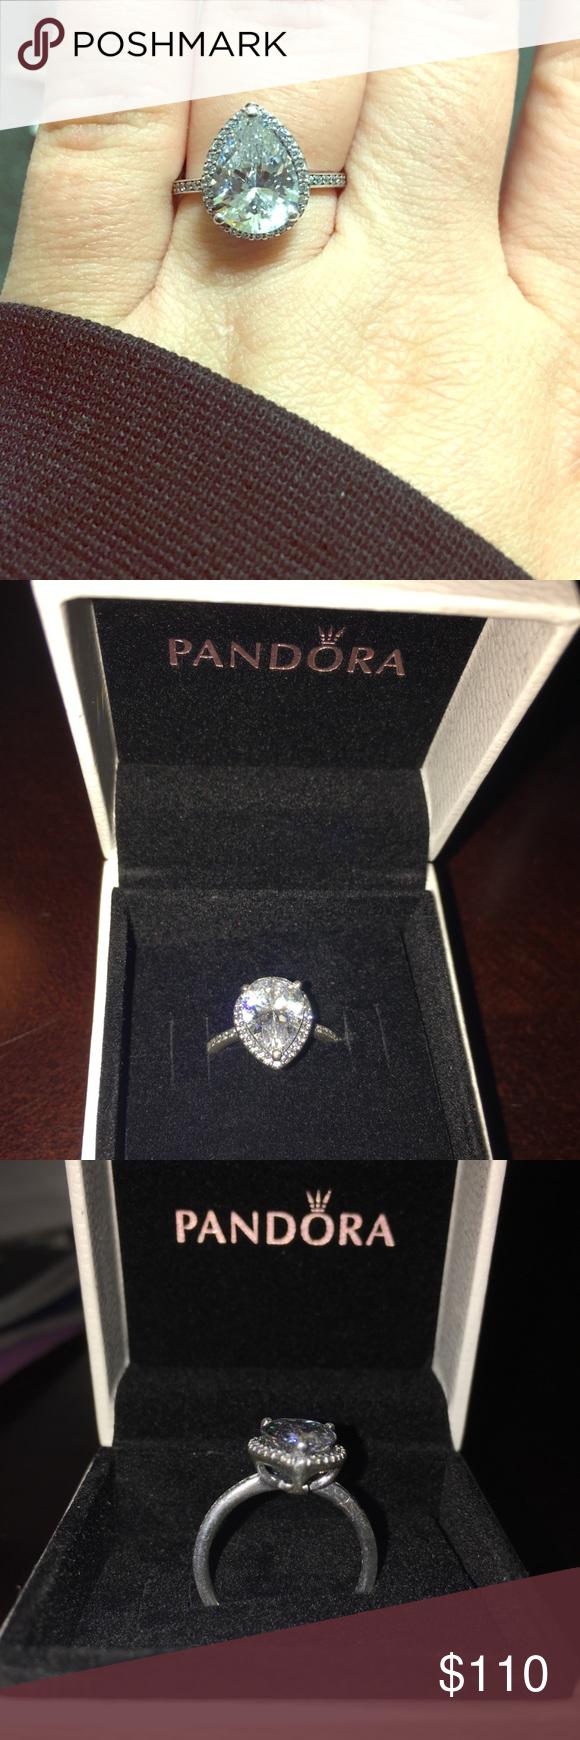 Pandora Radiant teardrop ring size 6 Brand new, it's too loose on ...